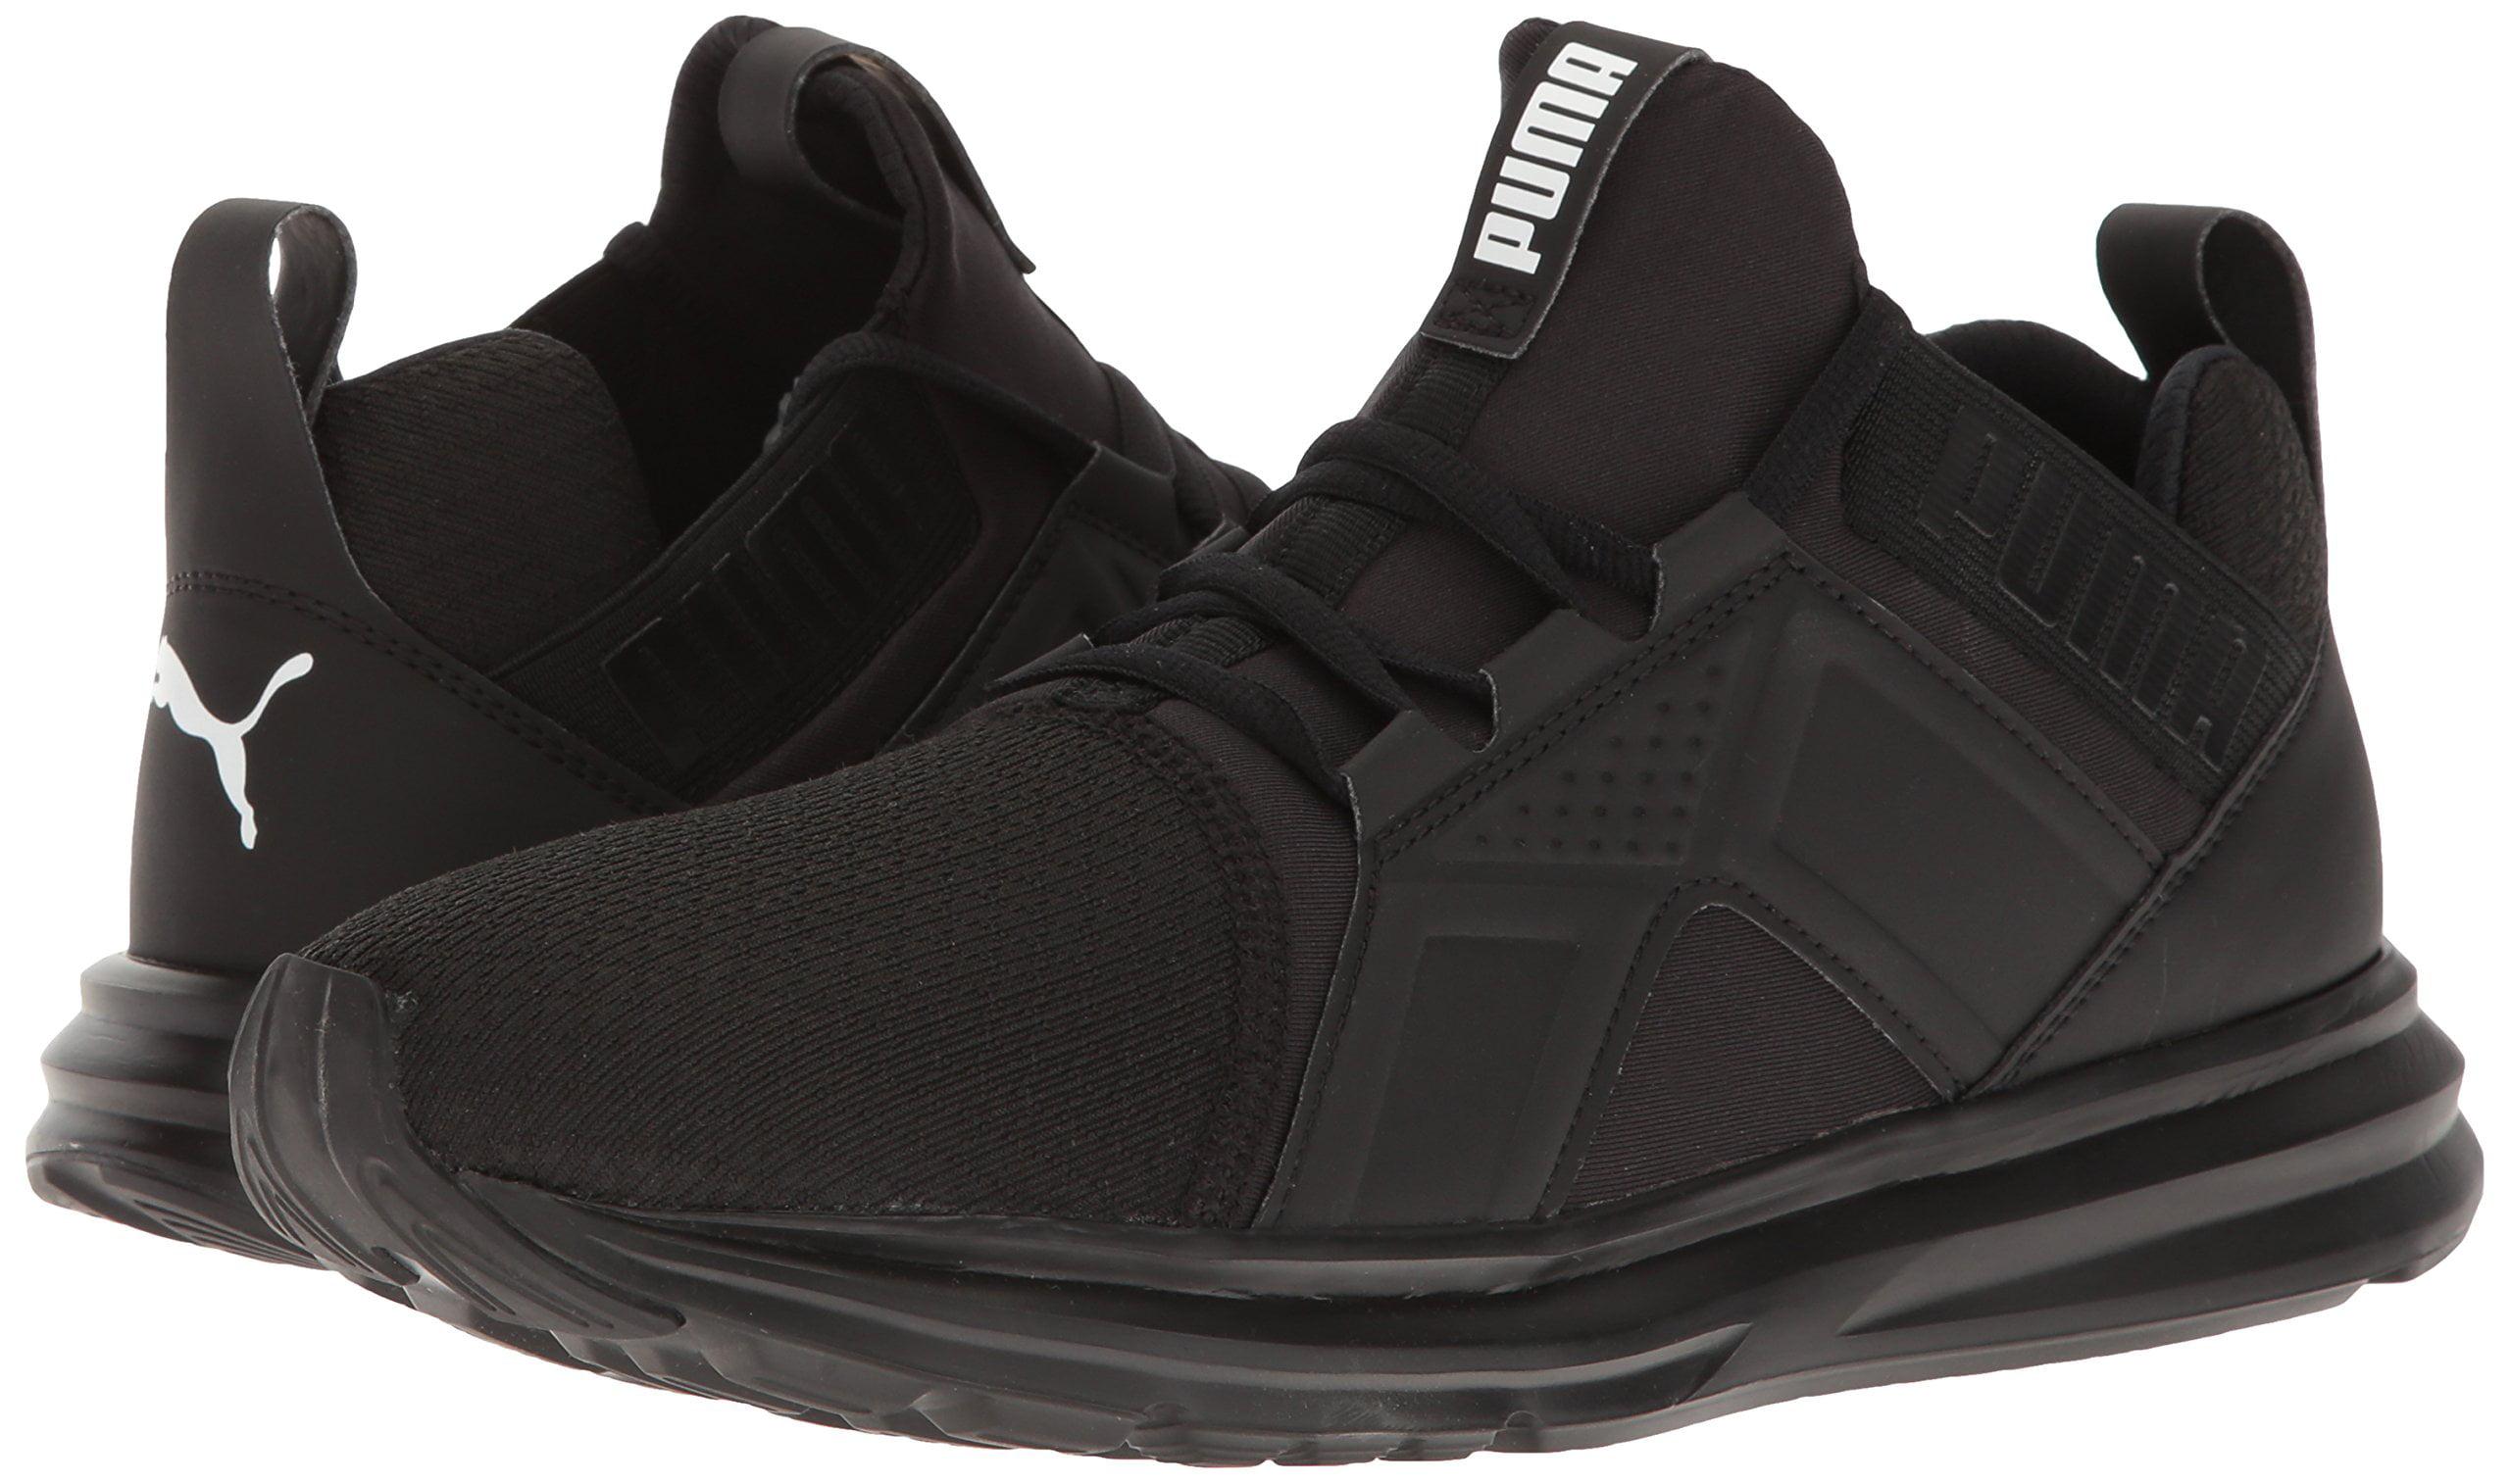 cae40aa02637 PUMA - PUMA 189498-03   Men s Enzo Sneaker Puma Black (9.5 D(M) US) -  Walmart.com